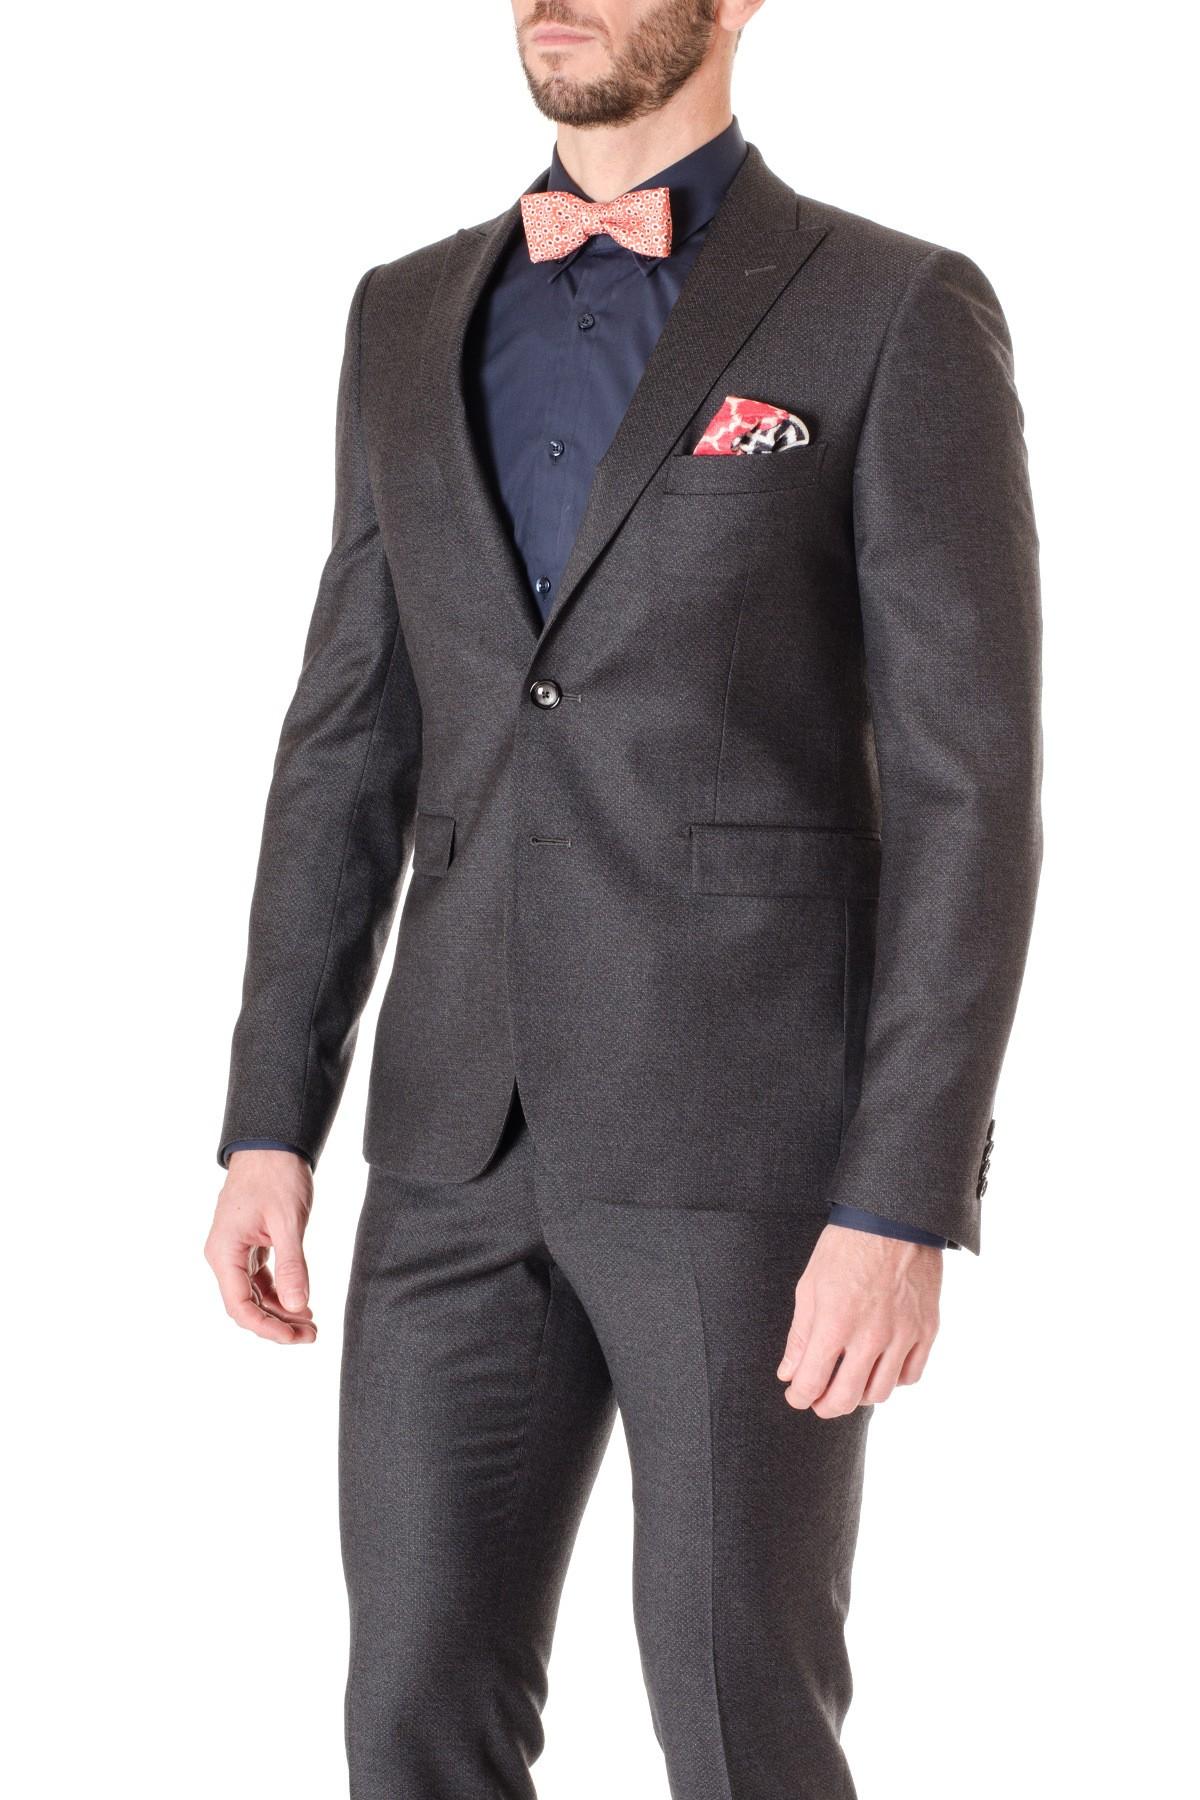 low priced d0fd5 34e60 TAGLIATORE Abito grigio uomo linea SHADOW A/I